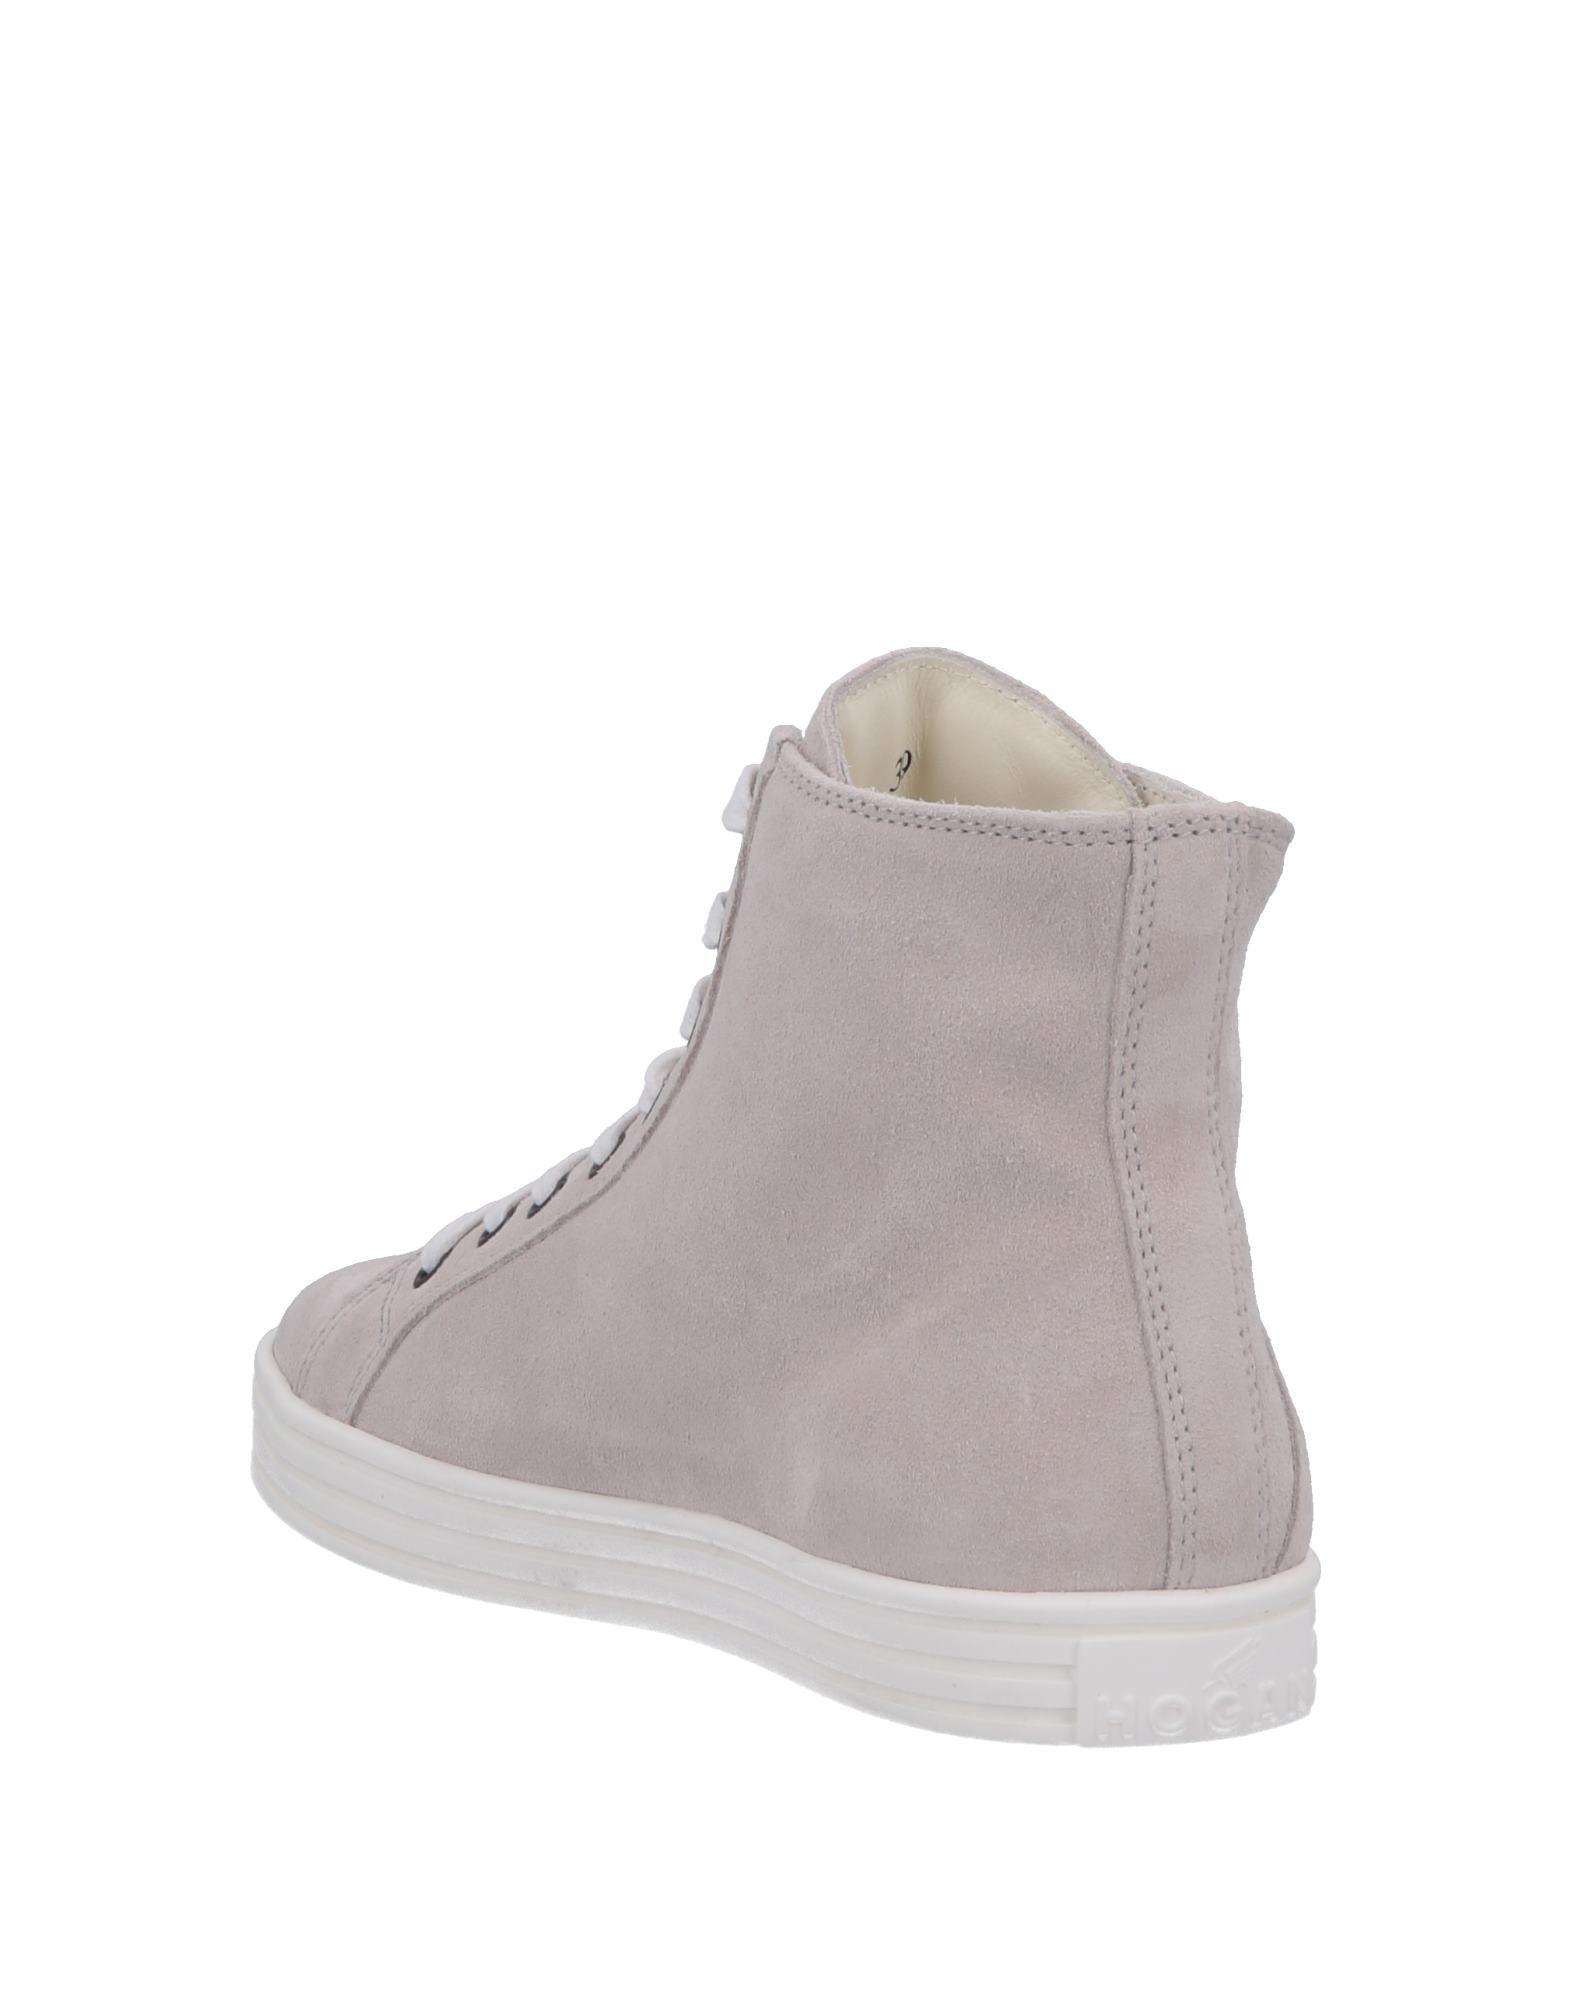 Lyst - Hogan Rebel High-tops   Sneakers in Gray c7f4e81b7c6